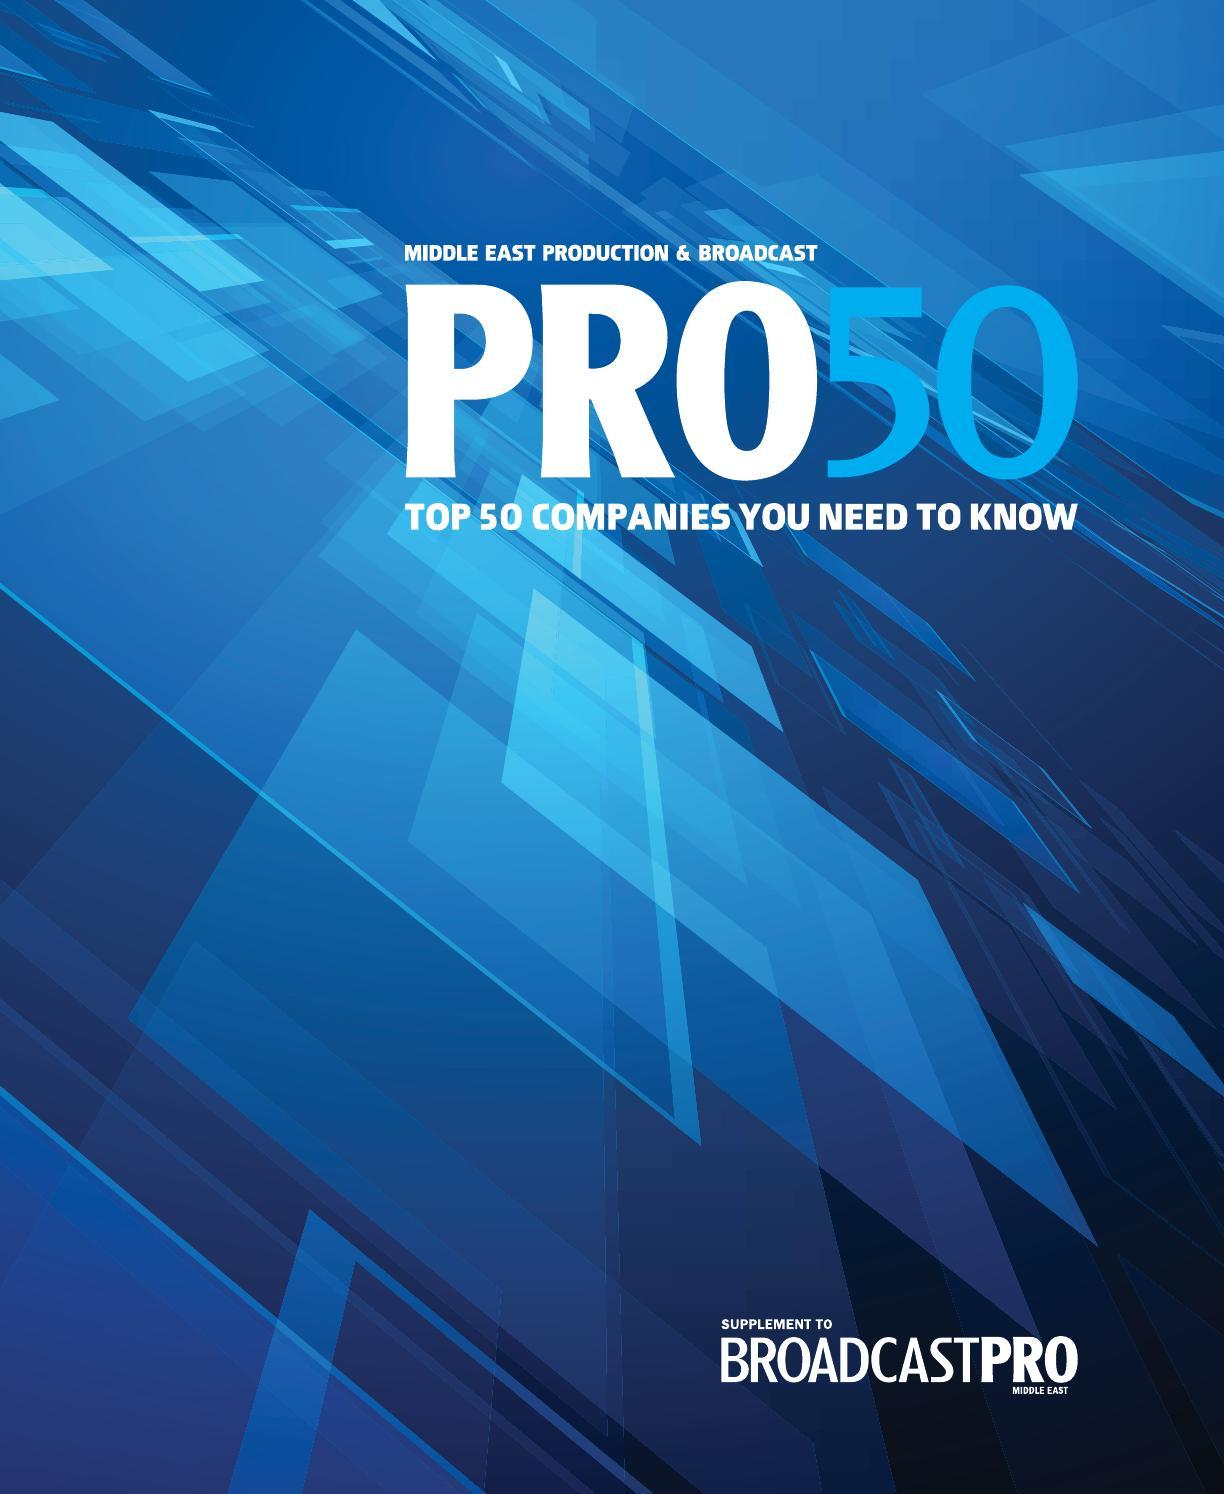 Pro50 2015 By Broadcastpro Me Issuu Vsat Diagram For Isp Network Setup Flickr Photo Sharing